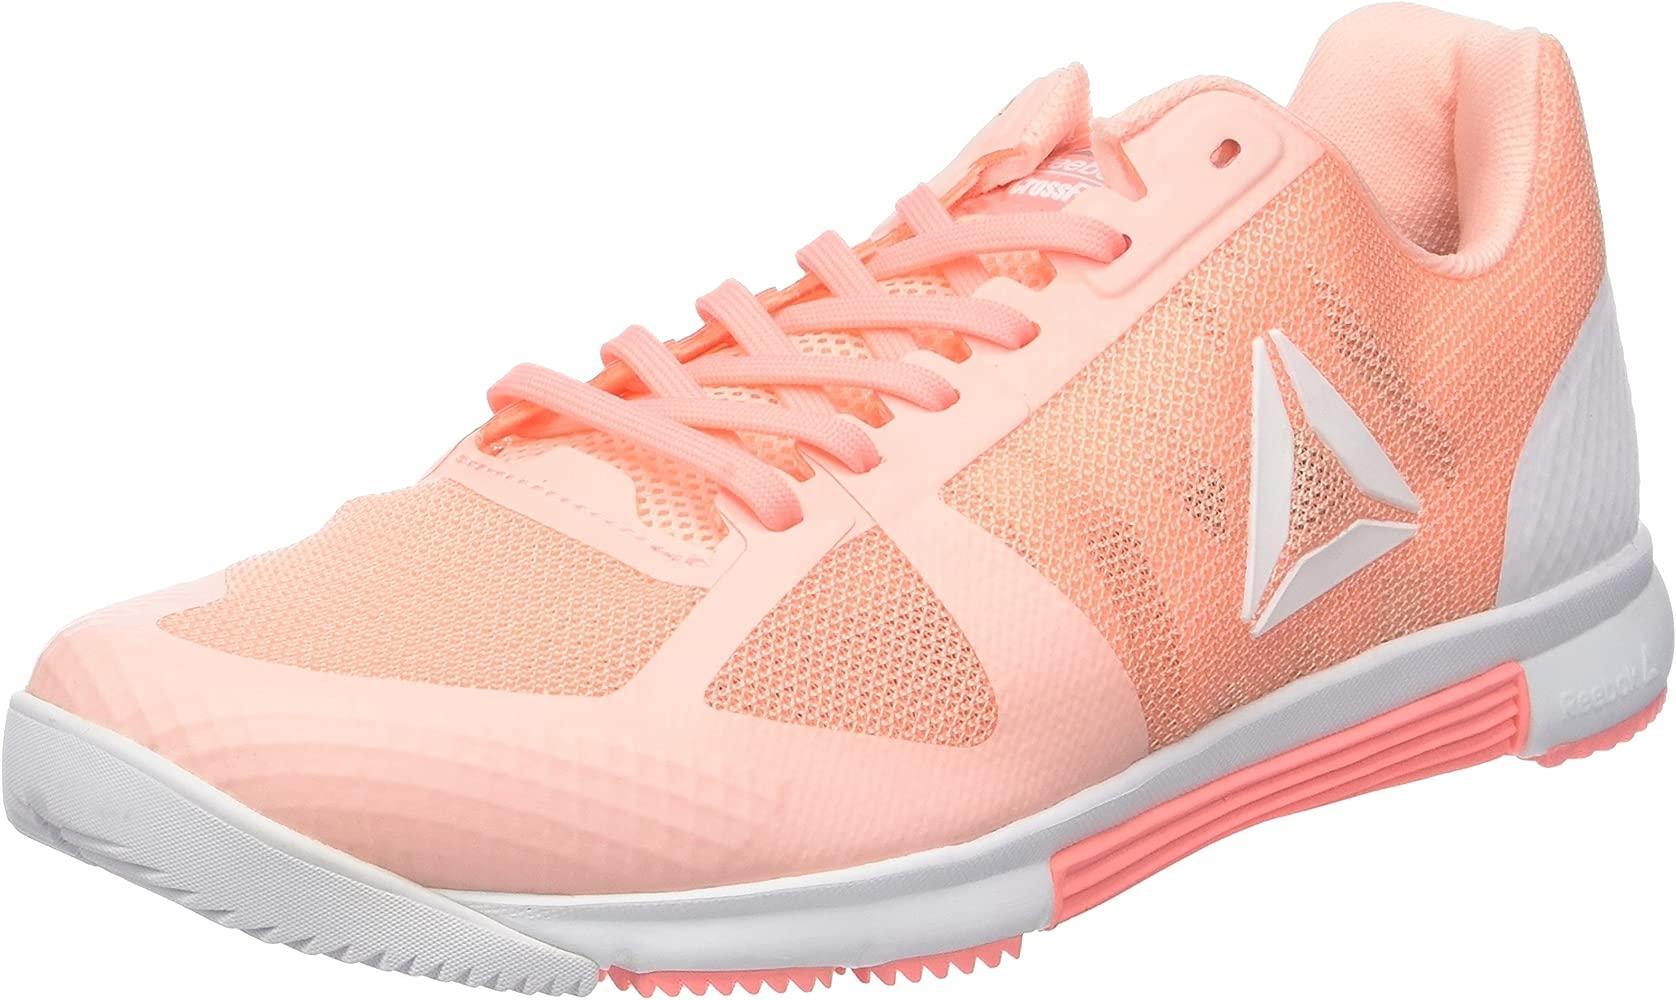 crossfit speed noir training reebok femmes 2 tr 0 chaussures gbI76yvYf